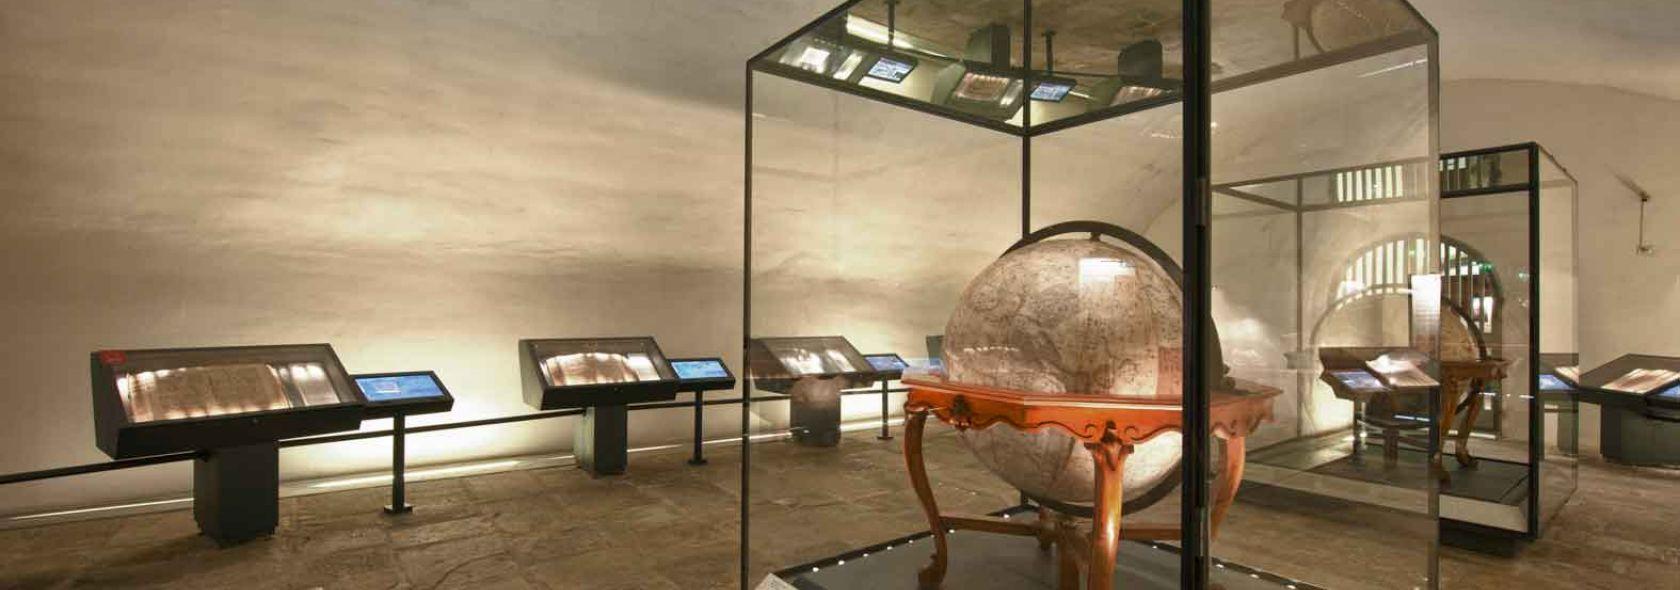 Galata Museo del Mare - Sala Globi